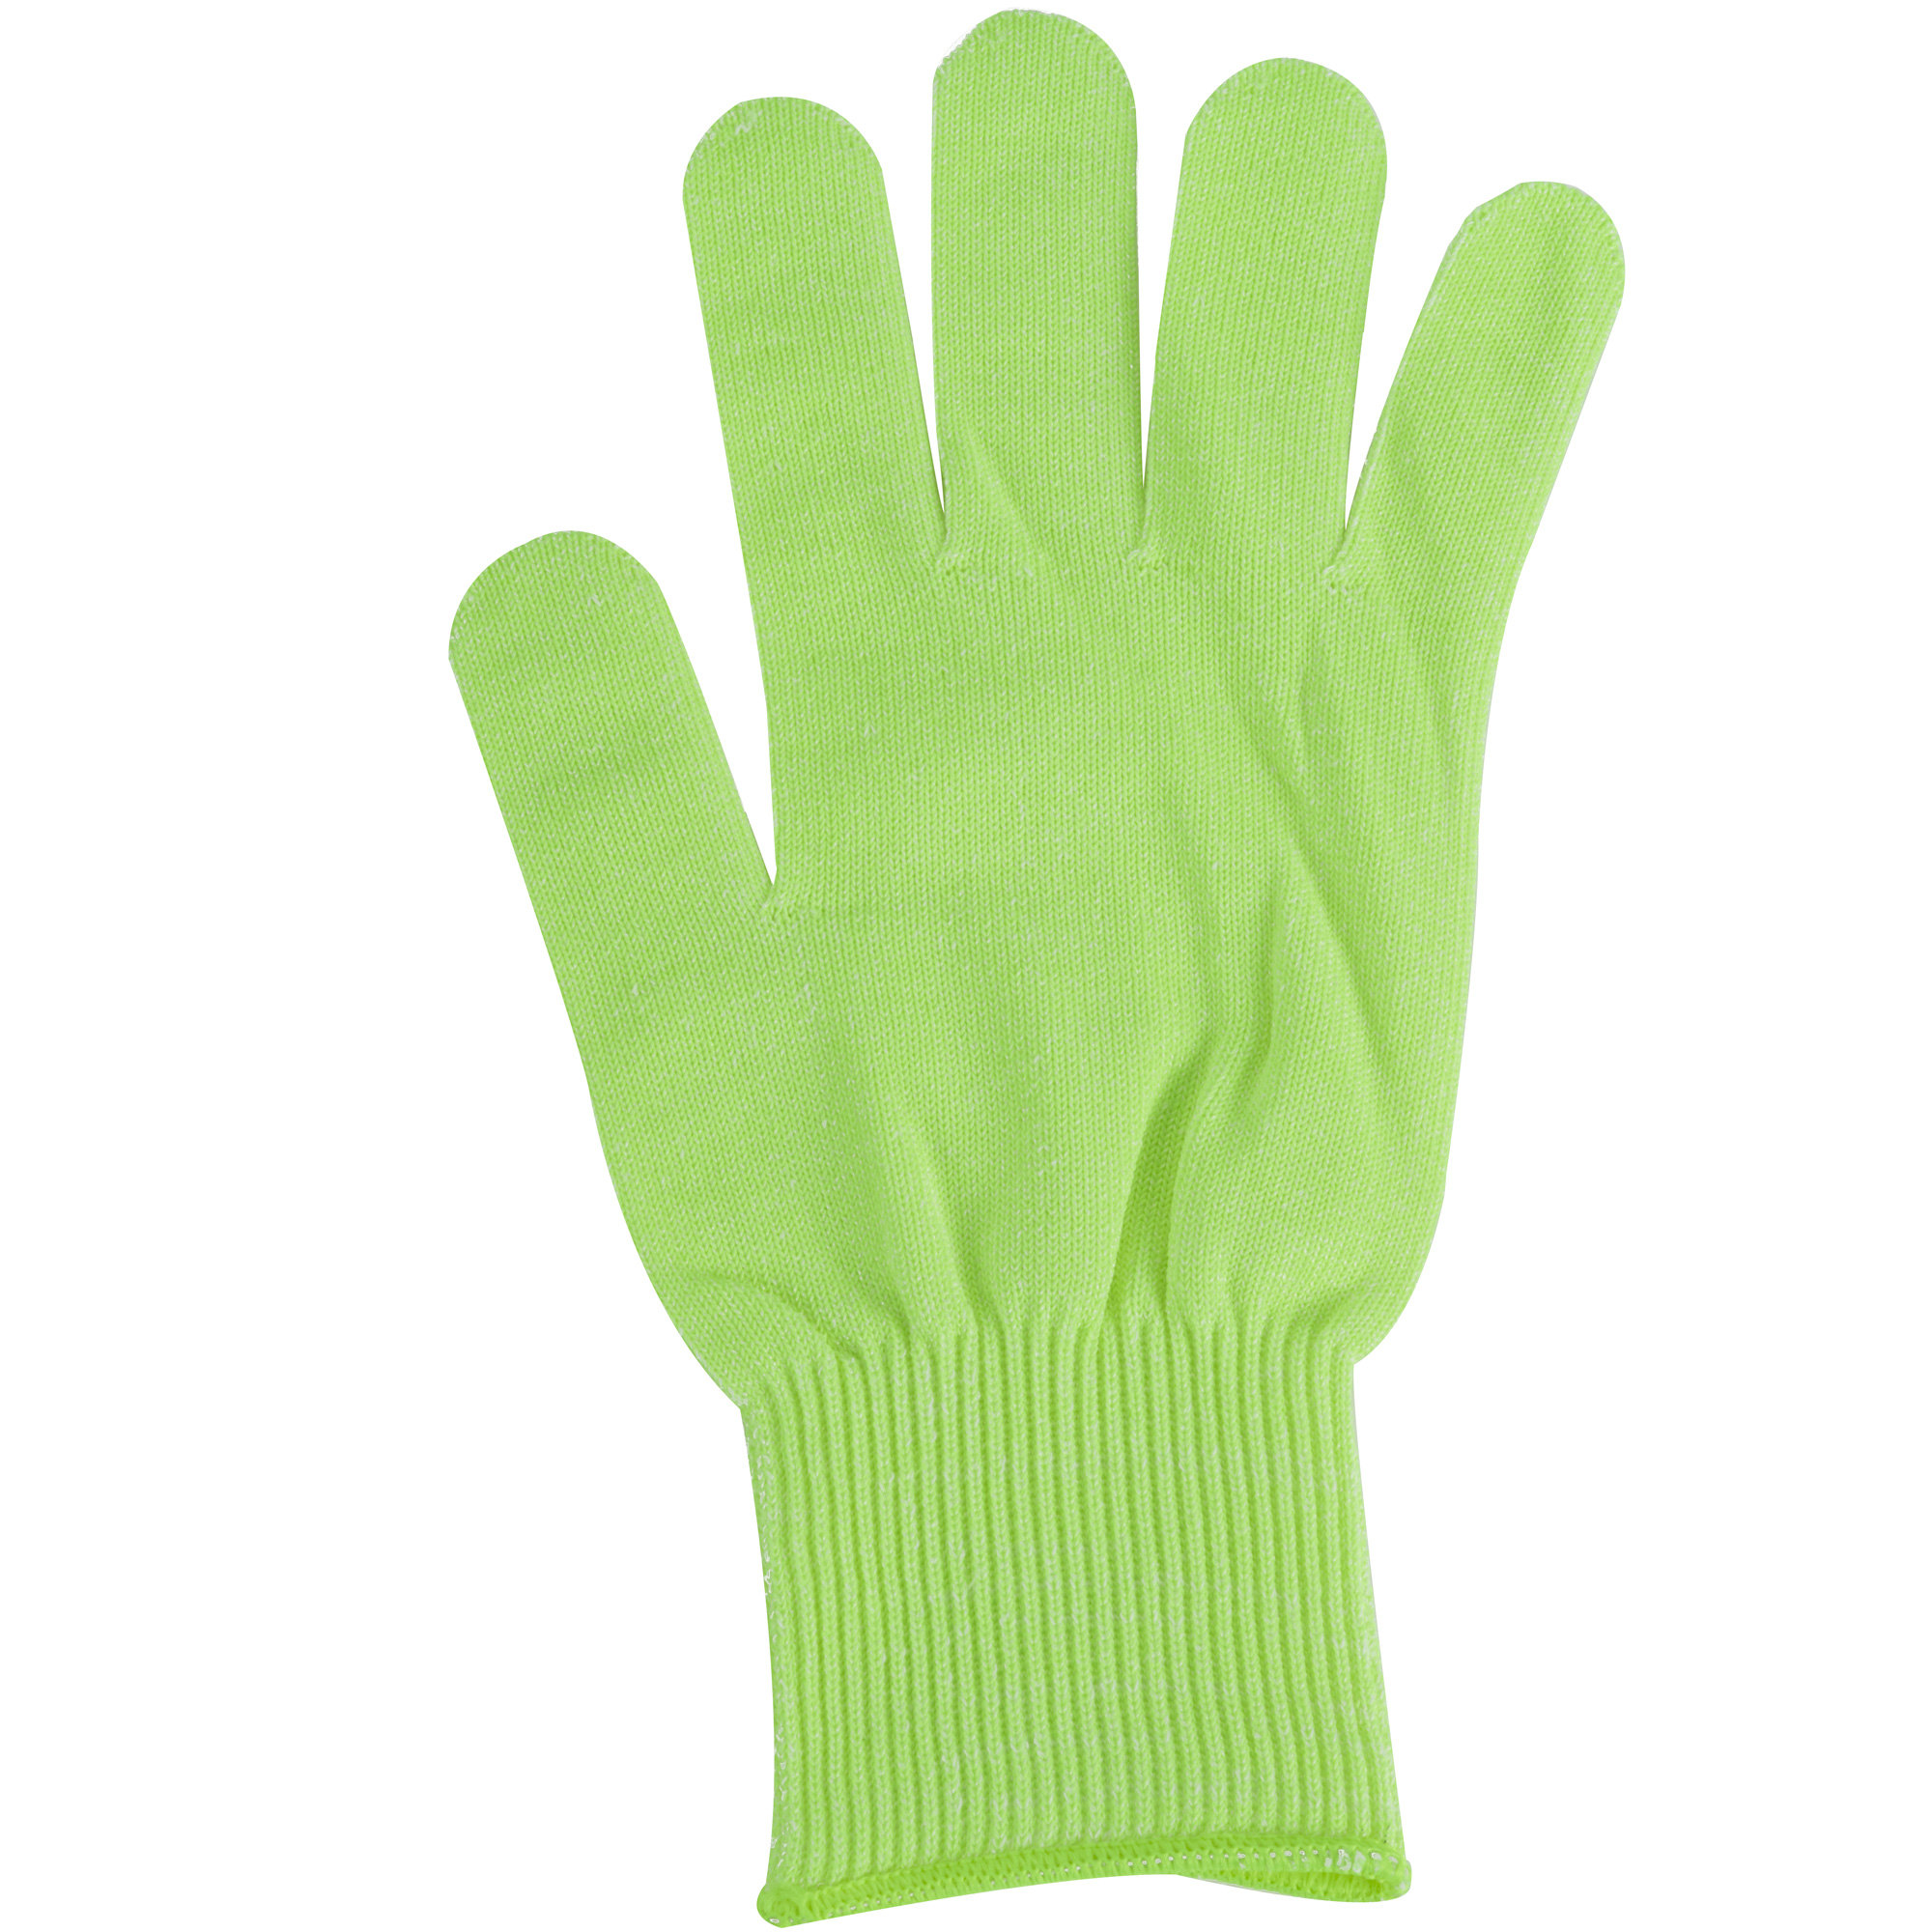 Victorinox Cut Resistant Gloves, PerformanceFit 1, Green